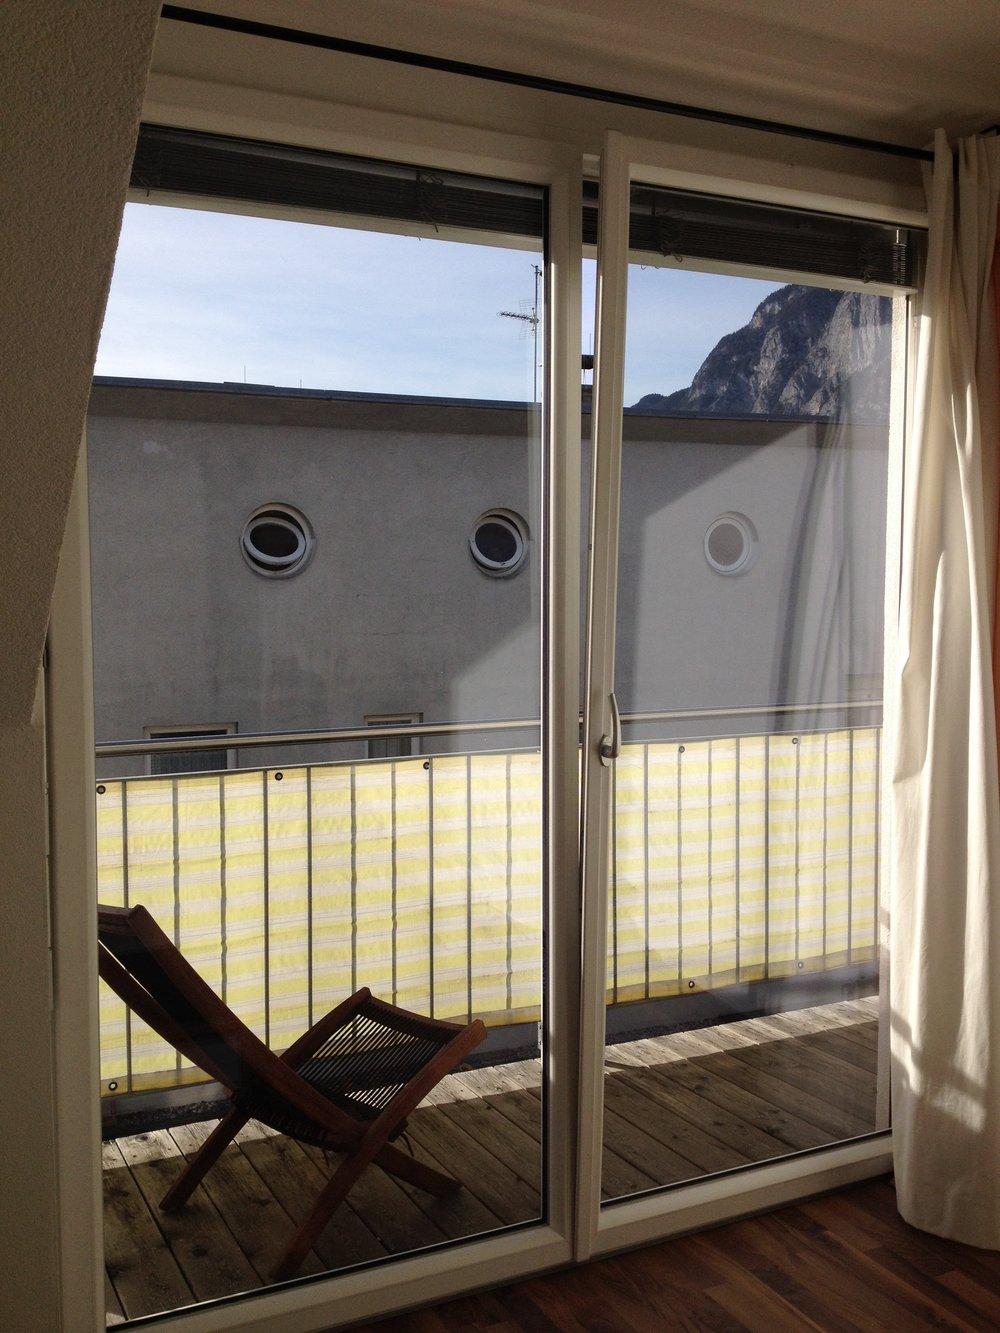 House with portholes